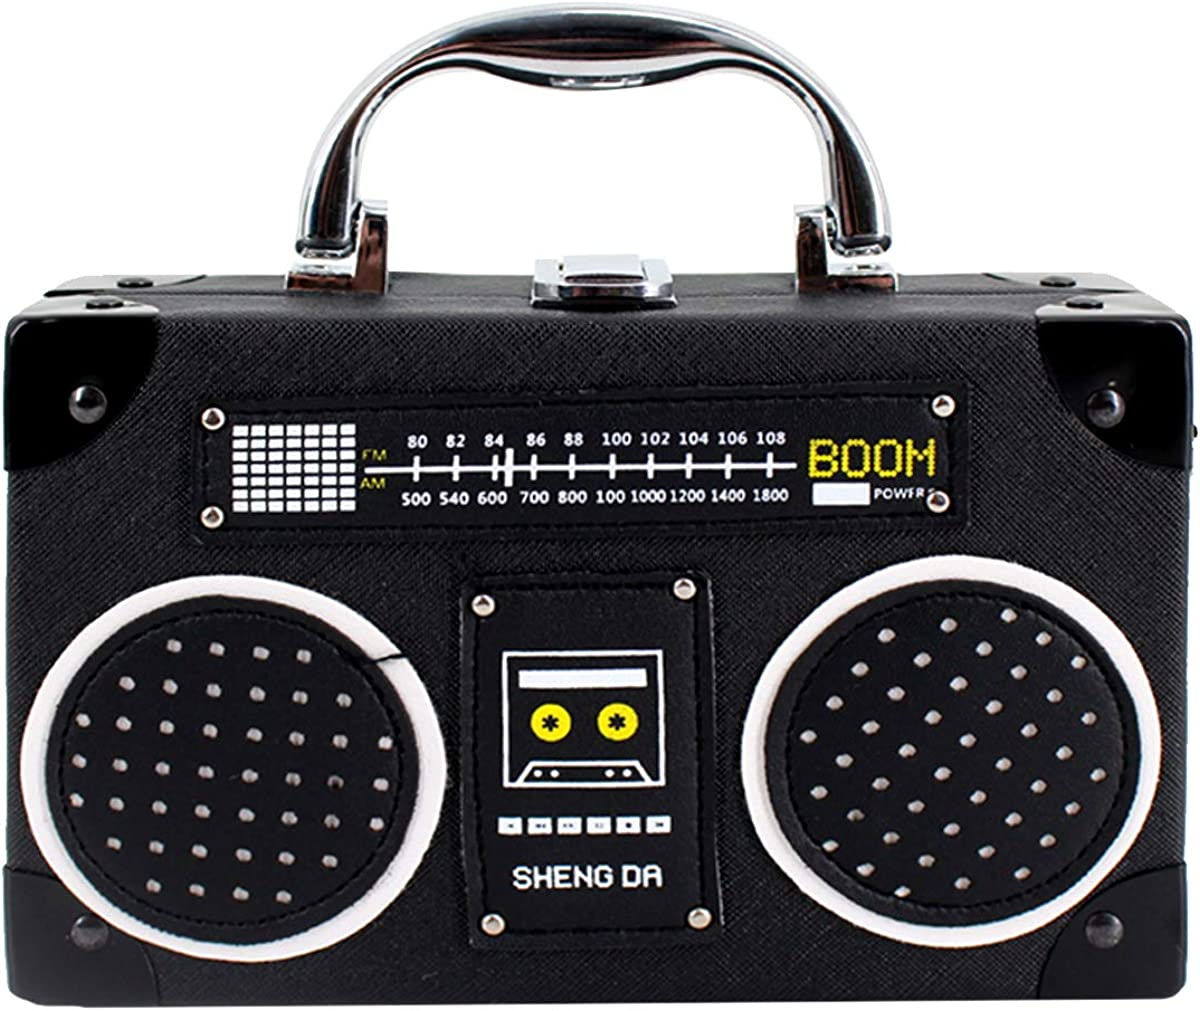 Heidi Bag lowest price Vintage Radio Clutch Top Handle Handbag Crossb OFFicial site Leather